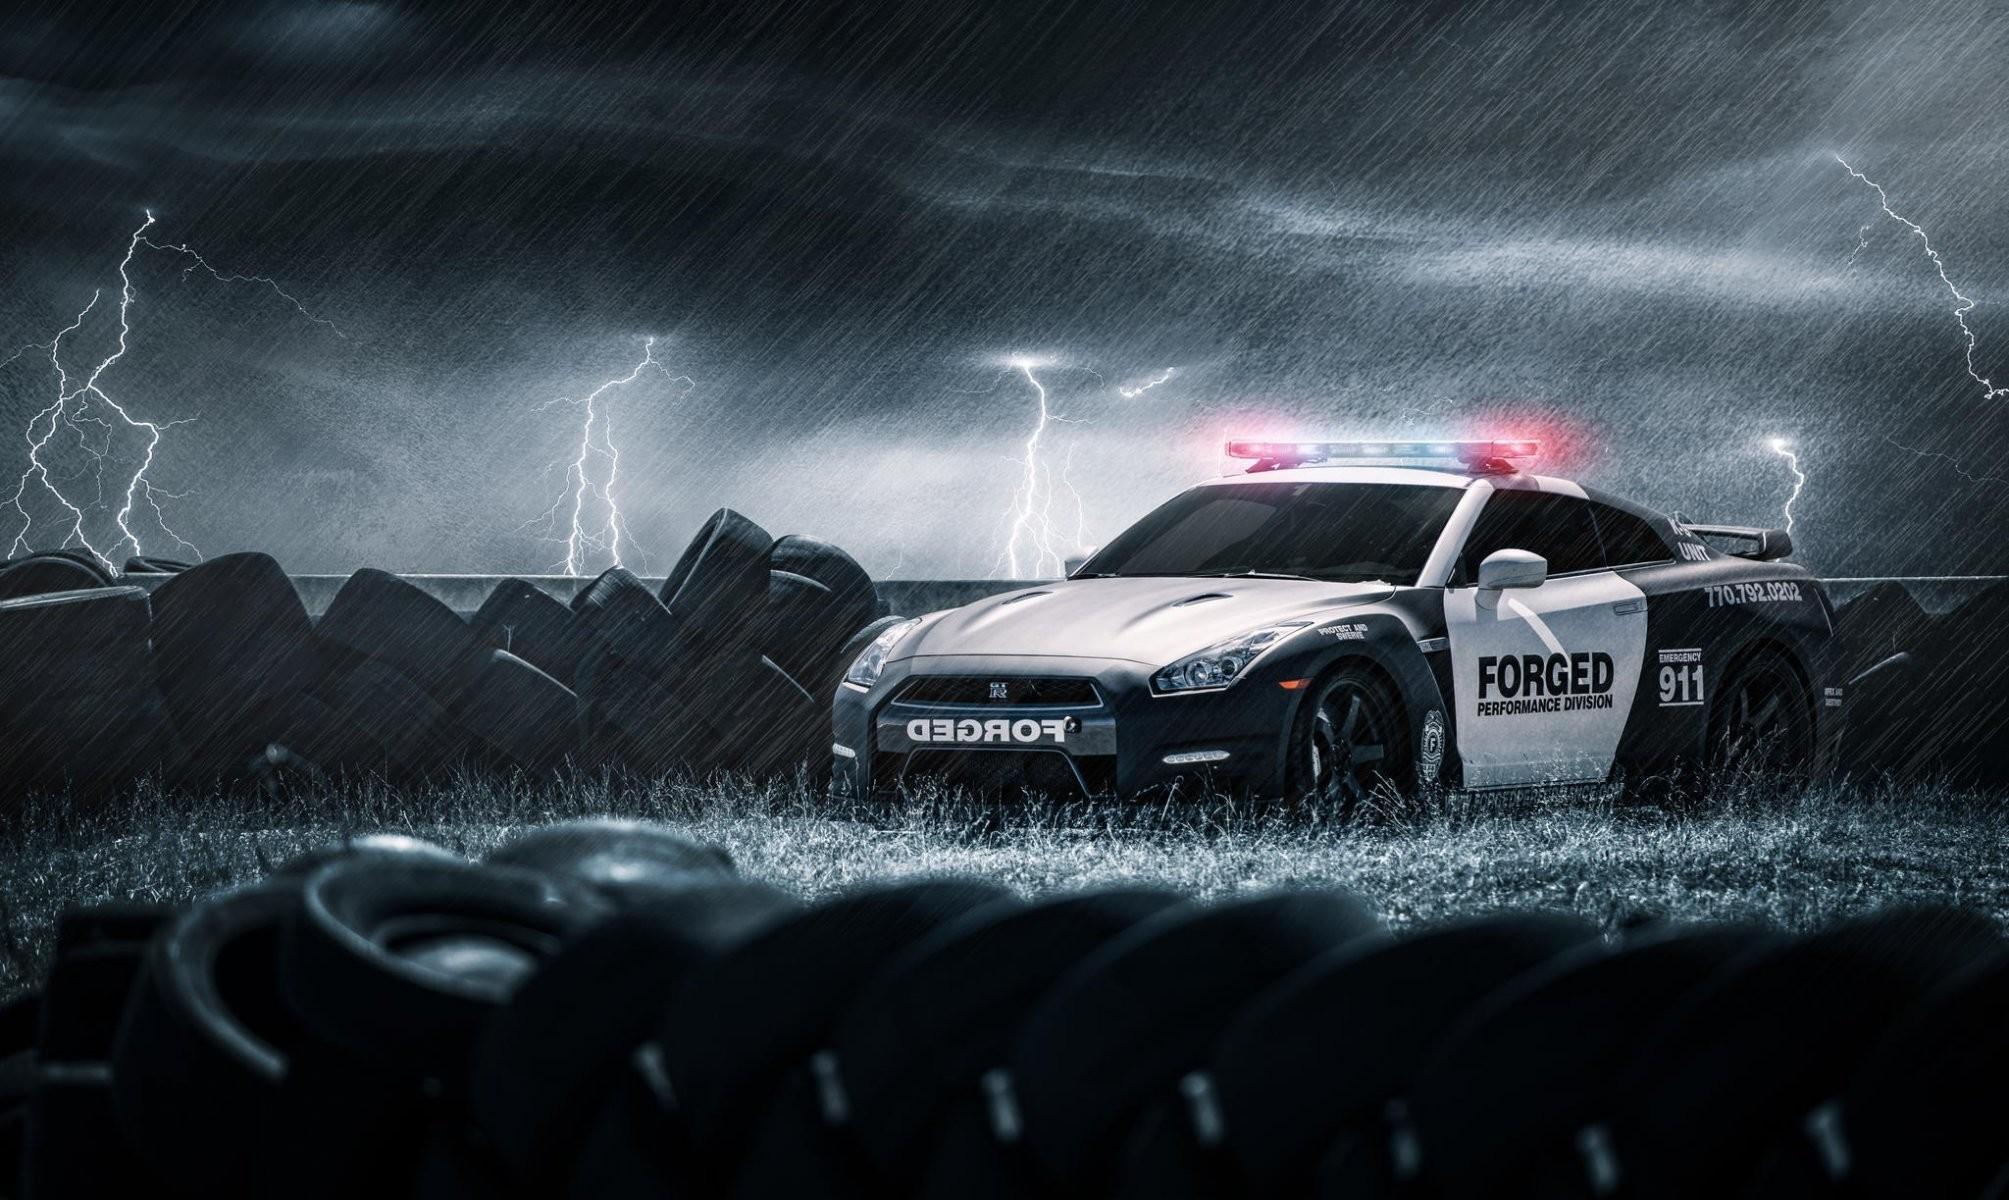 nissan gt-r black police nissan police tyres tyres rain lightning